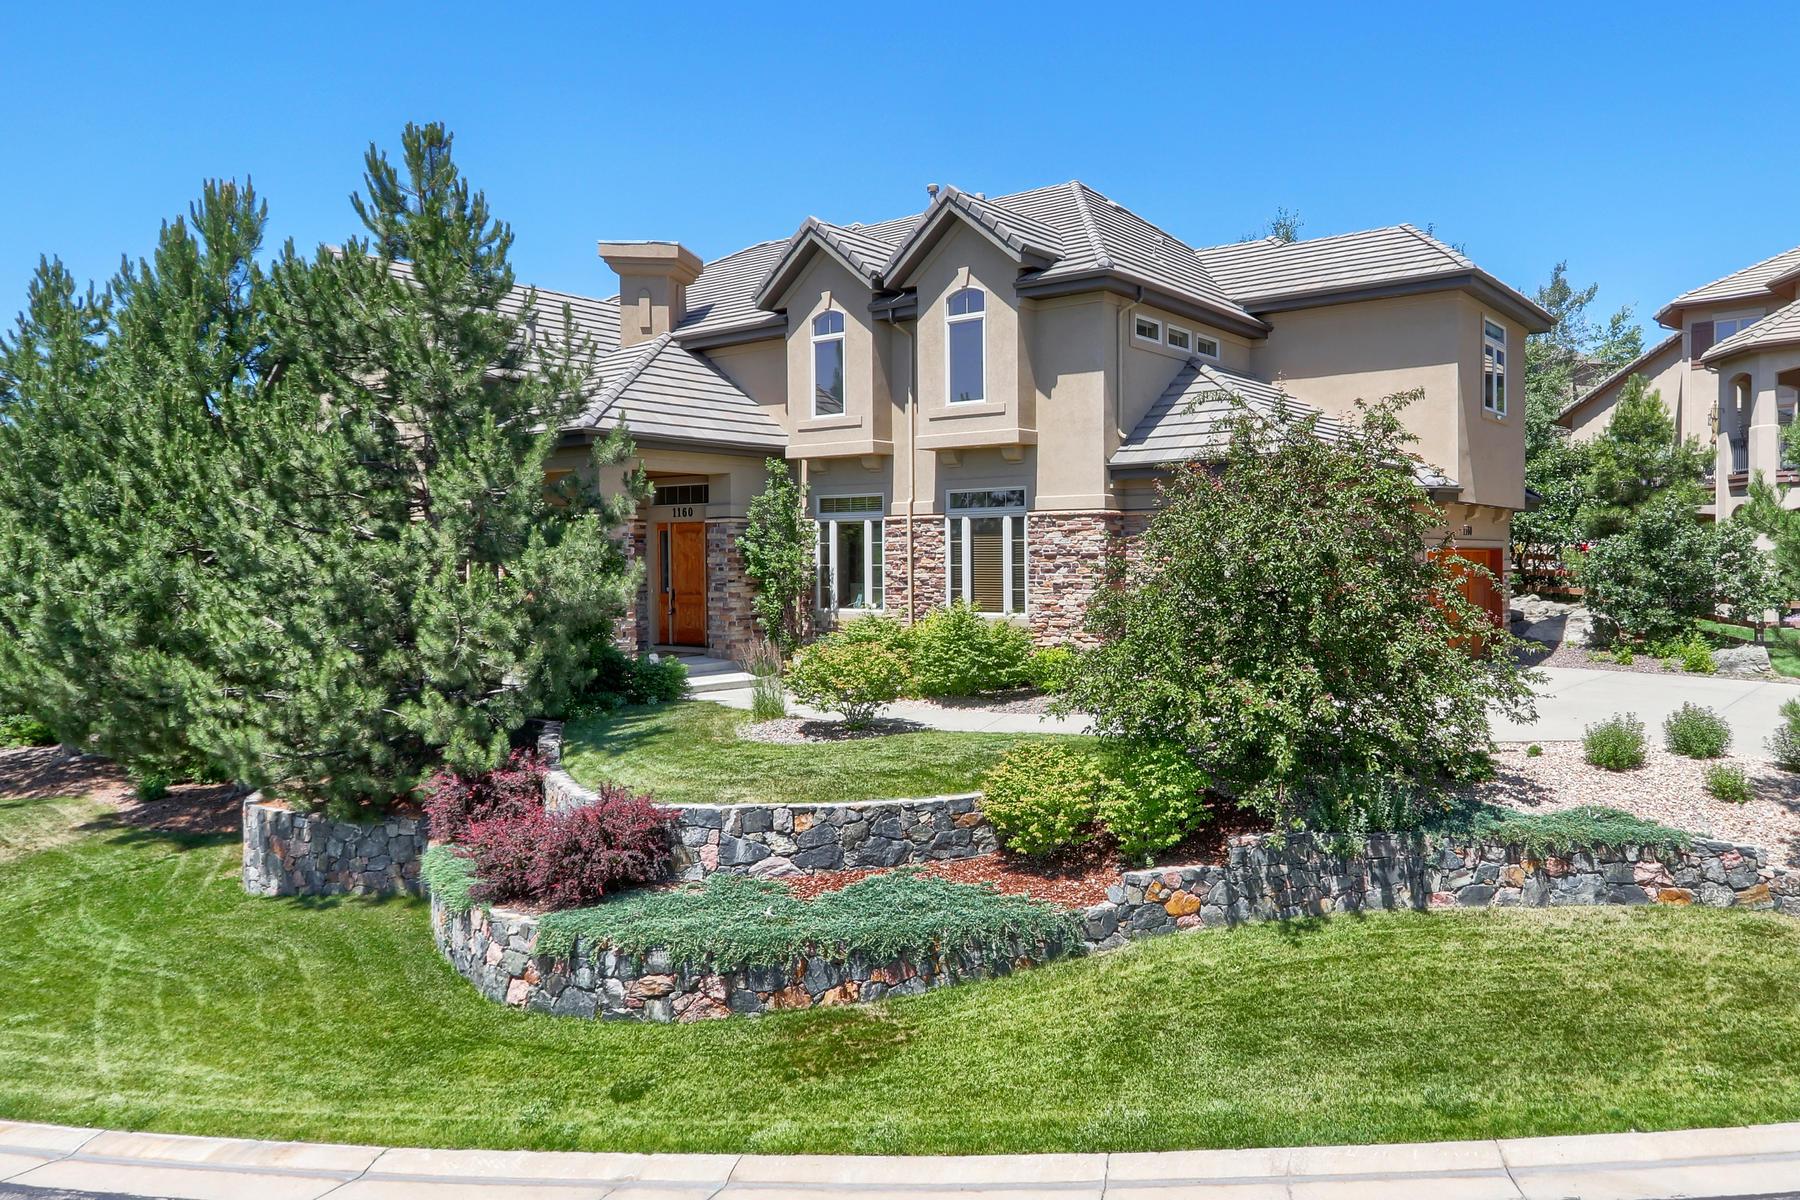 Single Family Homes for Sale at Immaculate 4 bedroom, 5 bath custom home located in gated Buffalo Ridge Estates. 1160 Buffalo Ridge Rd, Castle Pines, Colorado 80108 United States